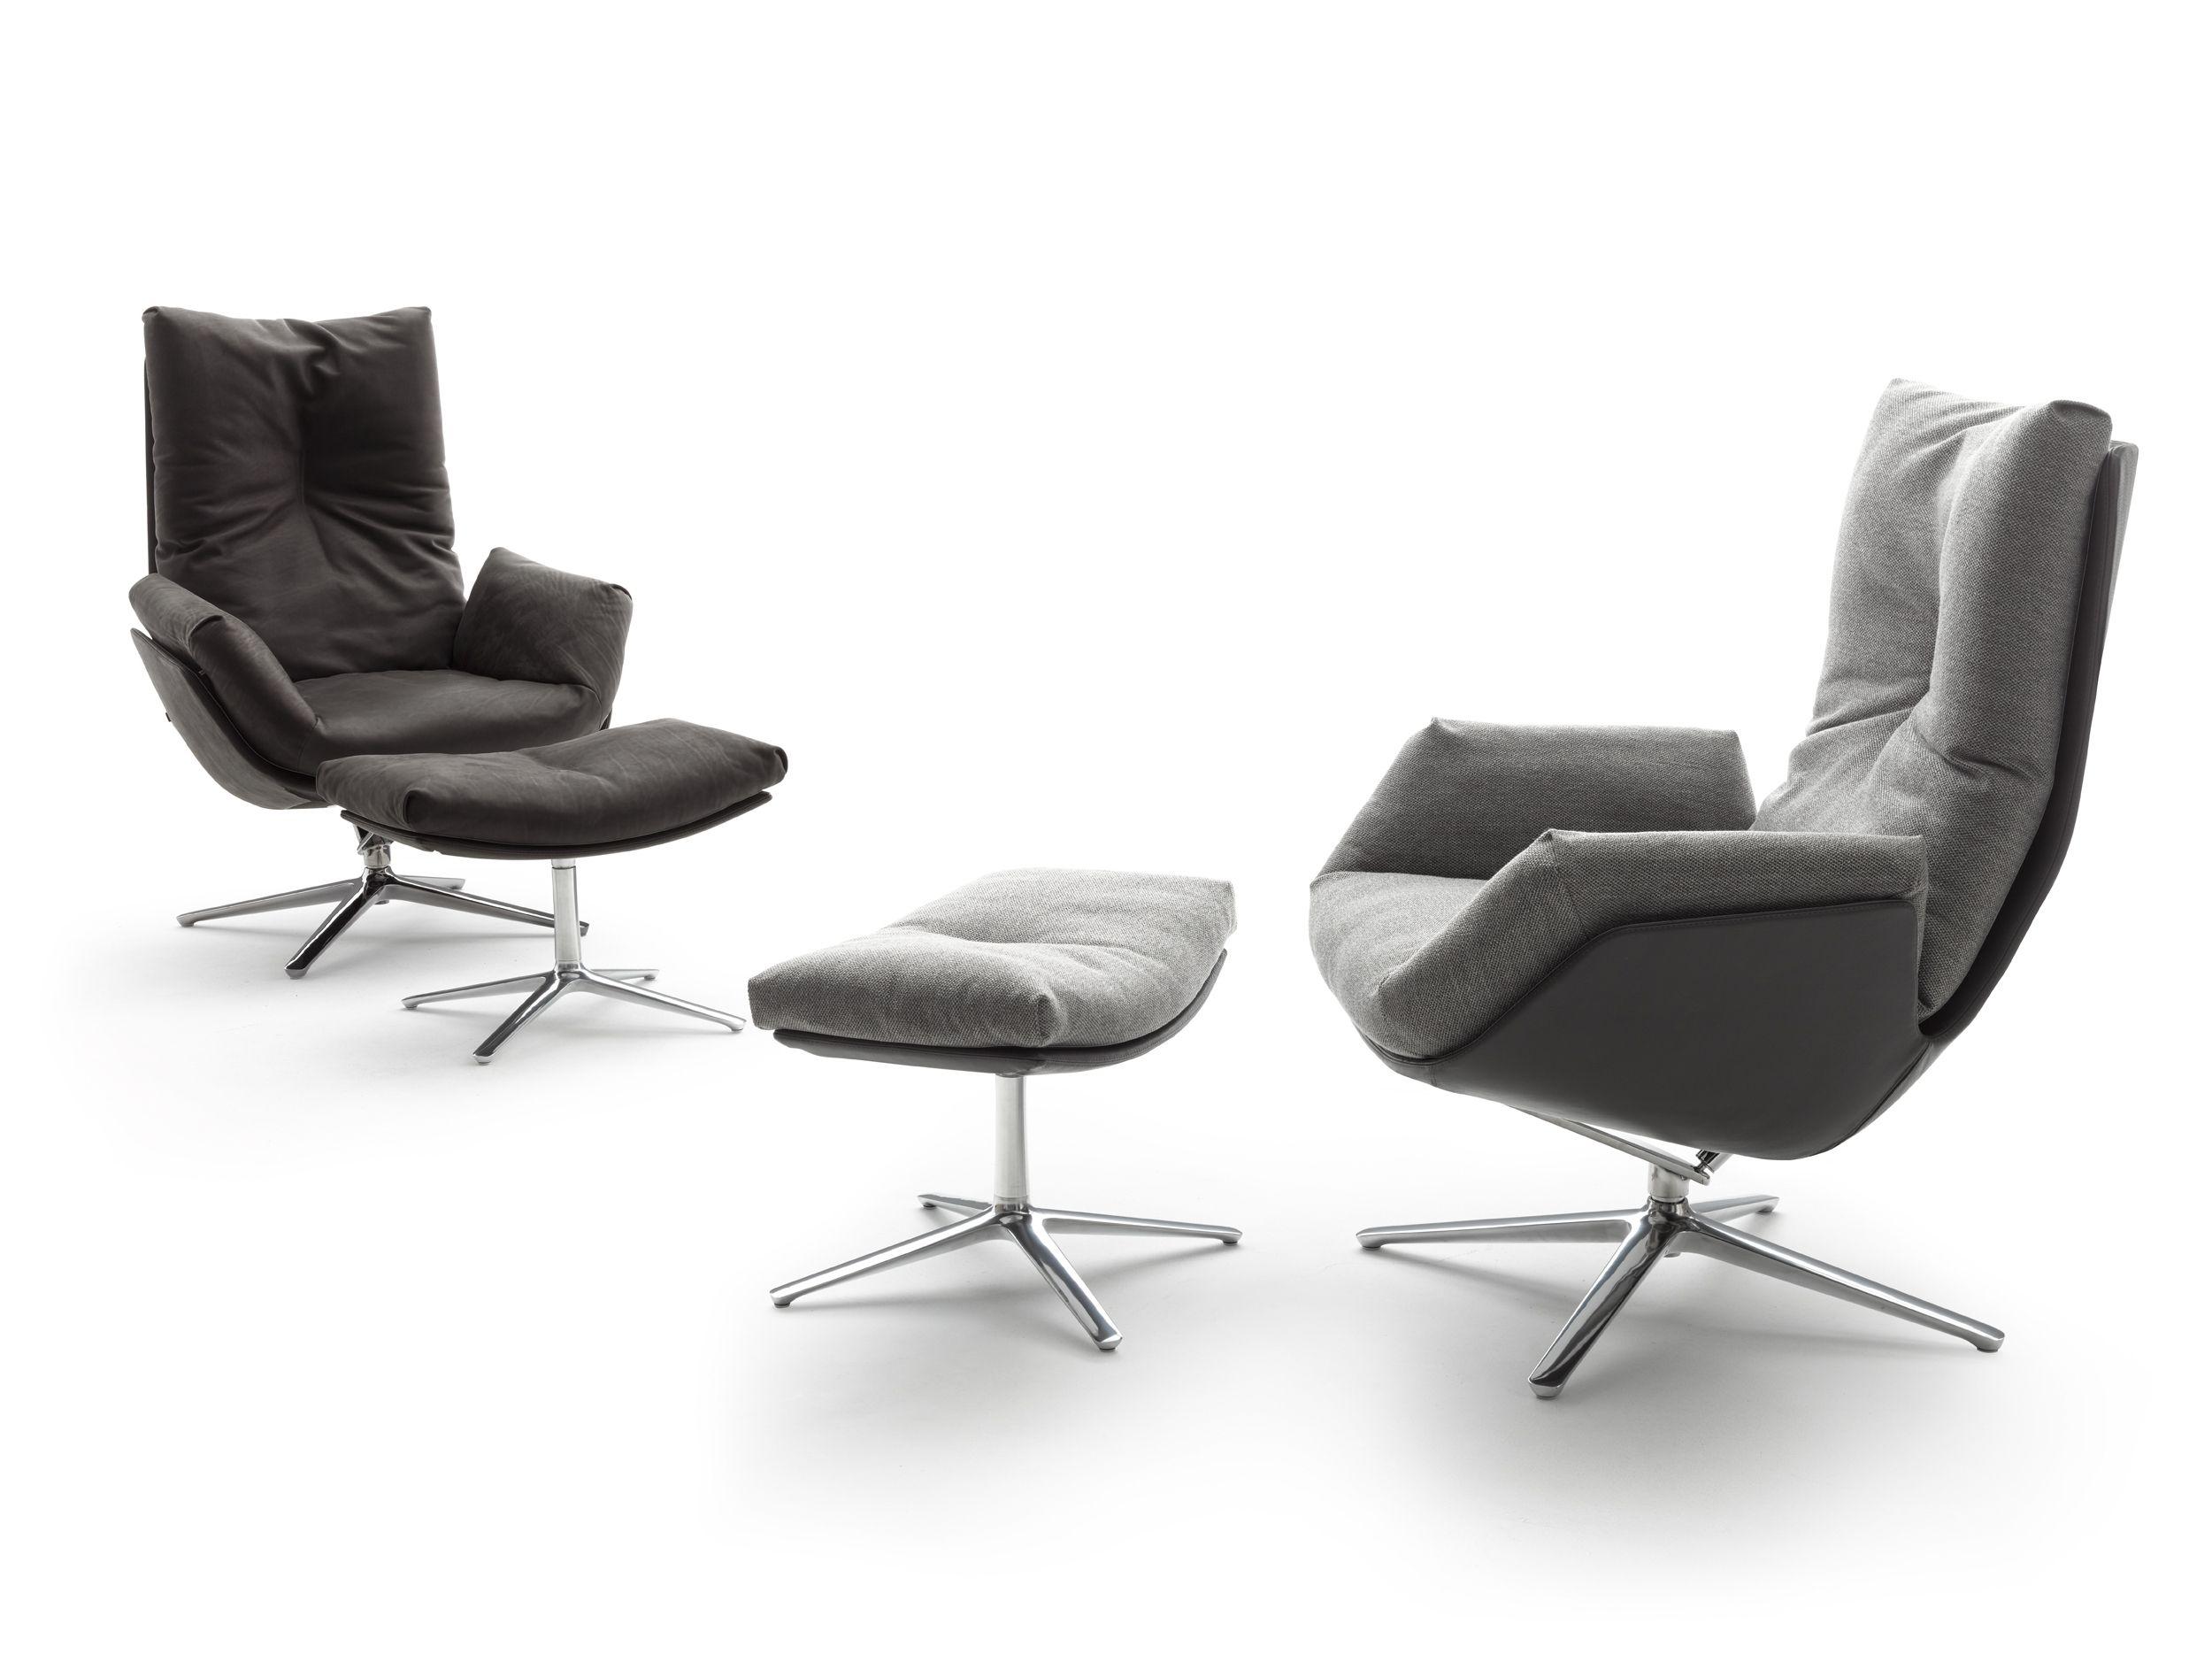 37+ Designer sessel mit hocker ideen